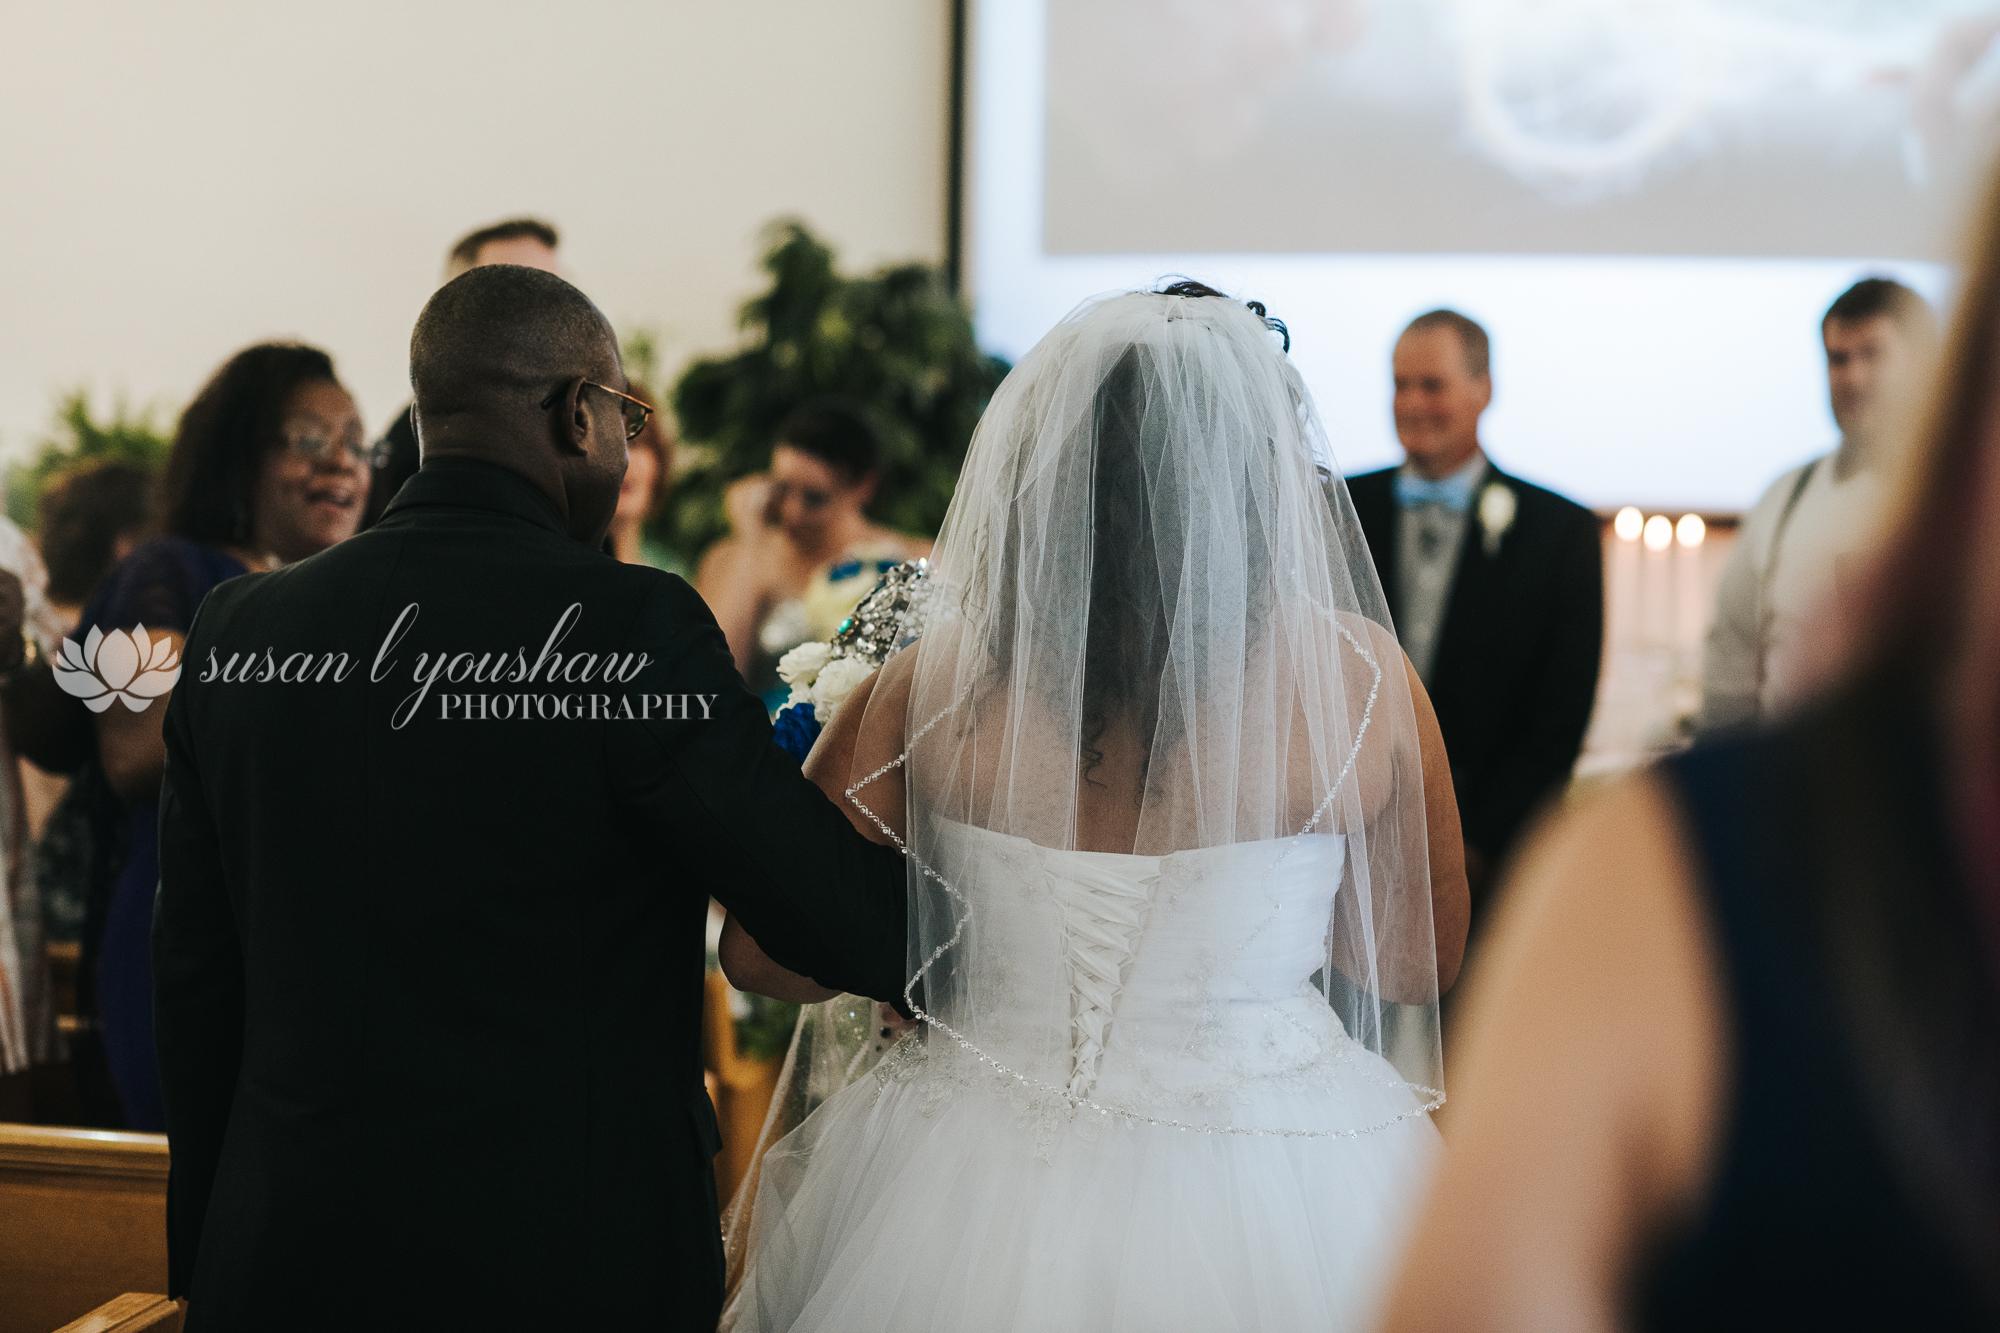 Katelyn and Wes Wedding Photos 07-13-2019 SLY Photography-44.jpg